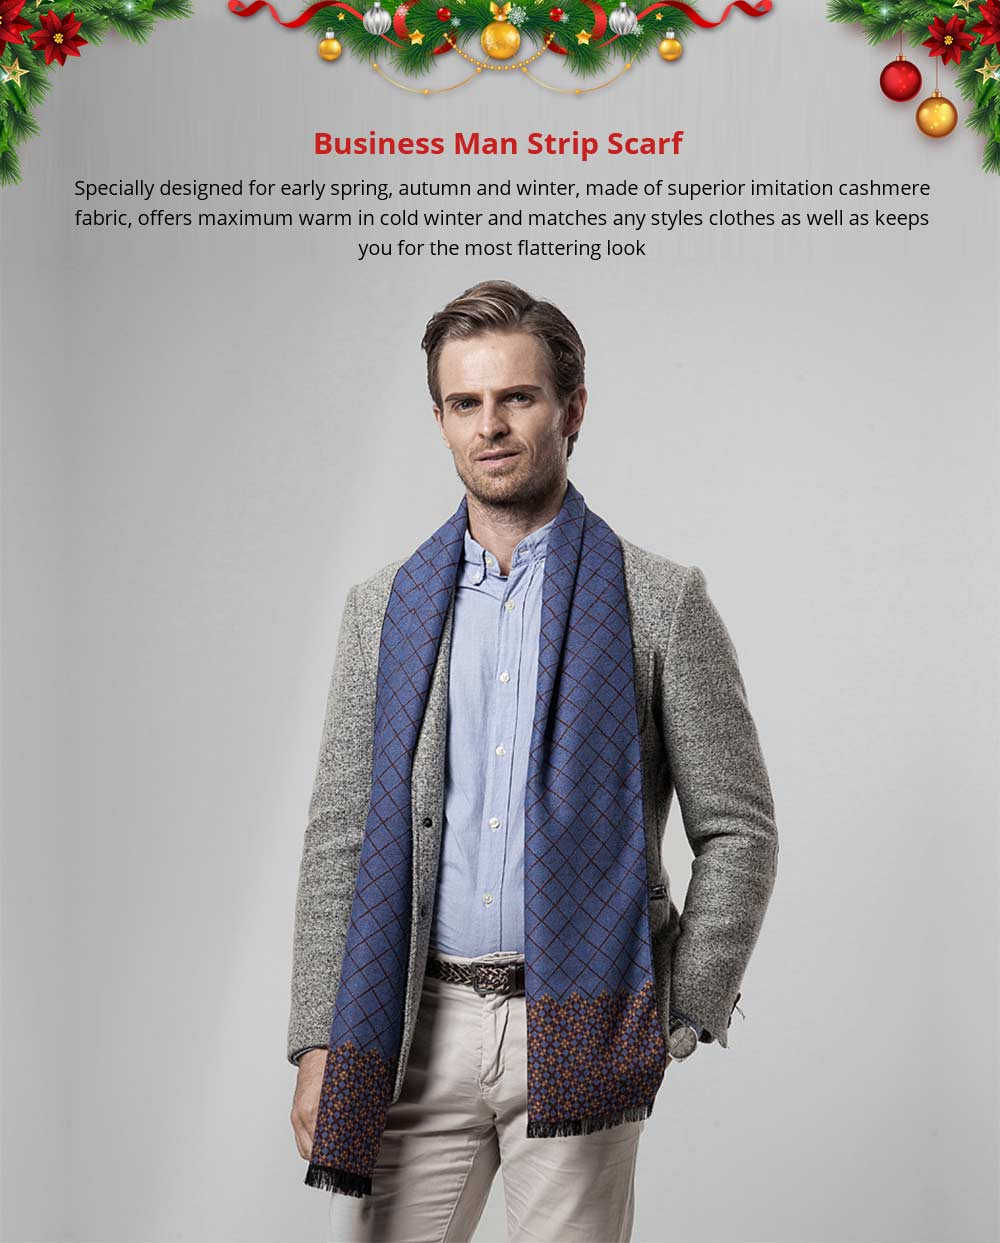 British Style Plaid Scarf for Men, Business Man, Gentleman, Unique Imitation Cashmere Plaid scarf, 2019 Brand New Men's Scarf 7